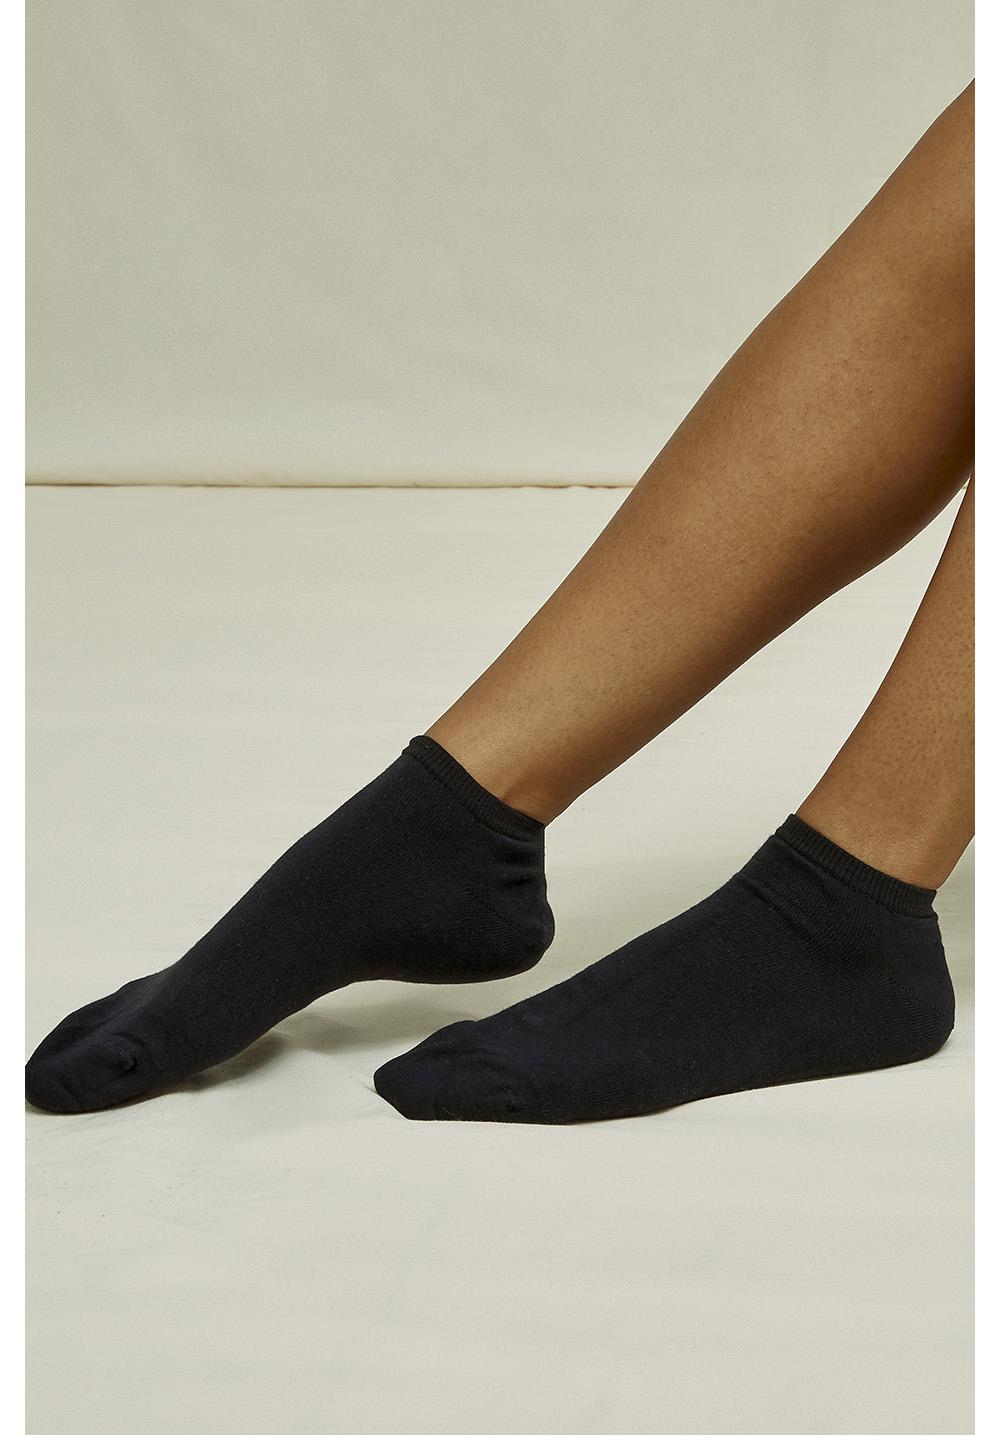 Organic Cotton Trainer Socks in Black